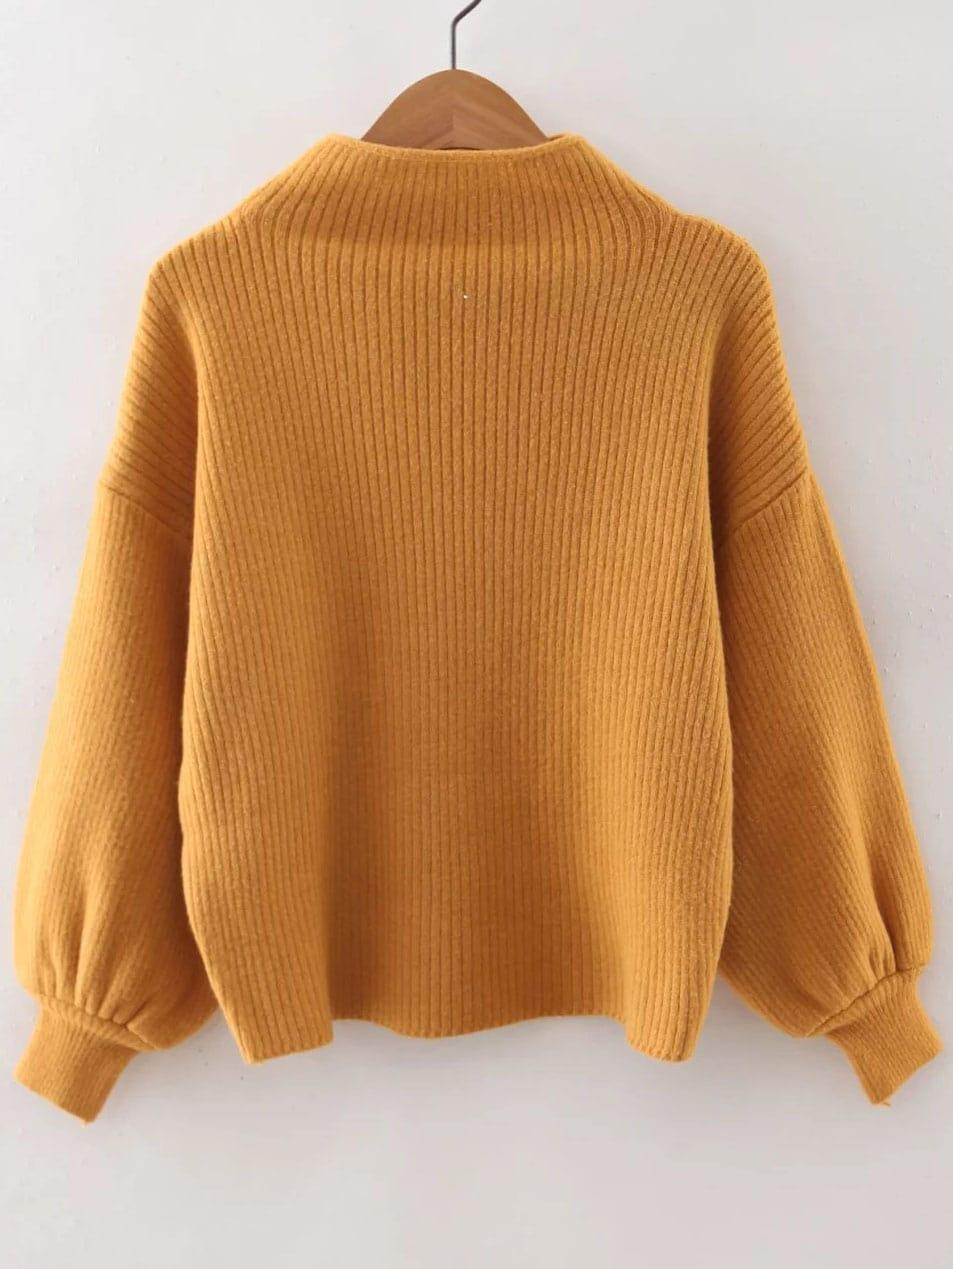 Yellow Ribbed Lantern Sleeve Loose Knitwear sweater160817227